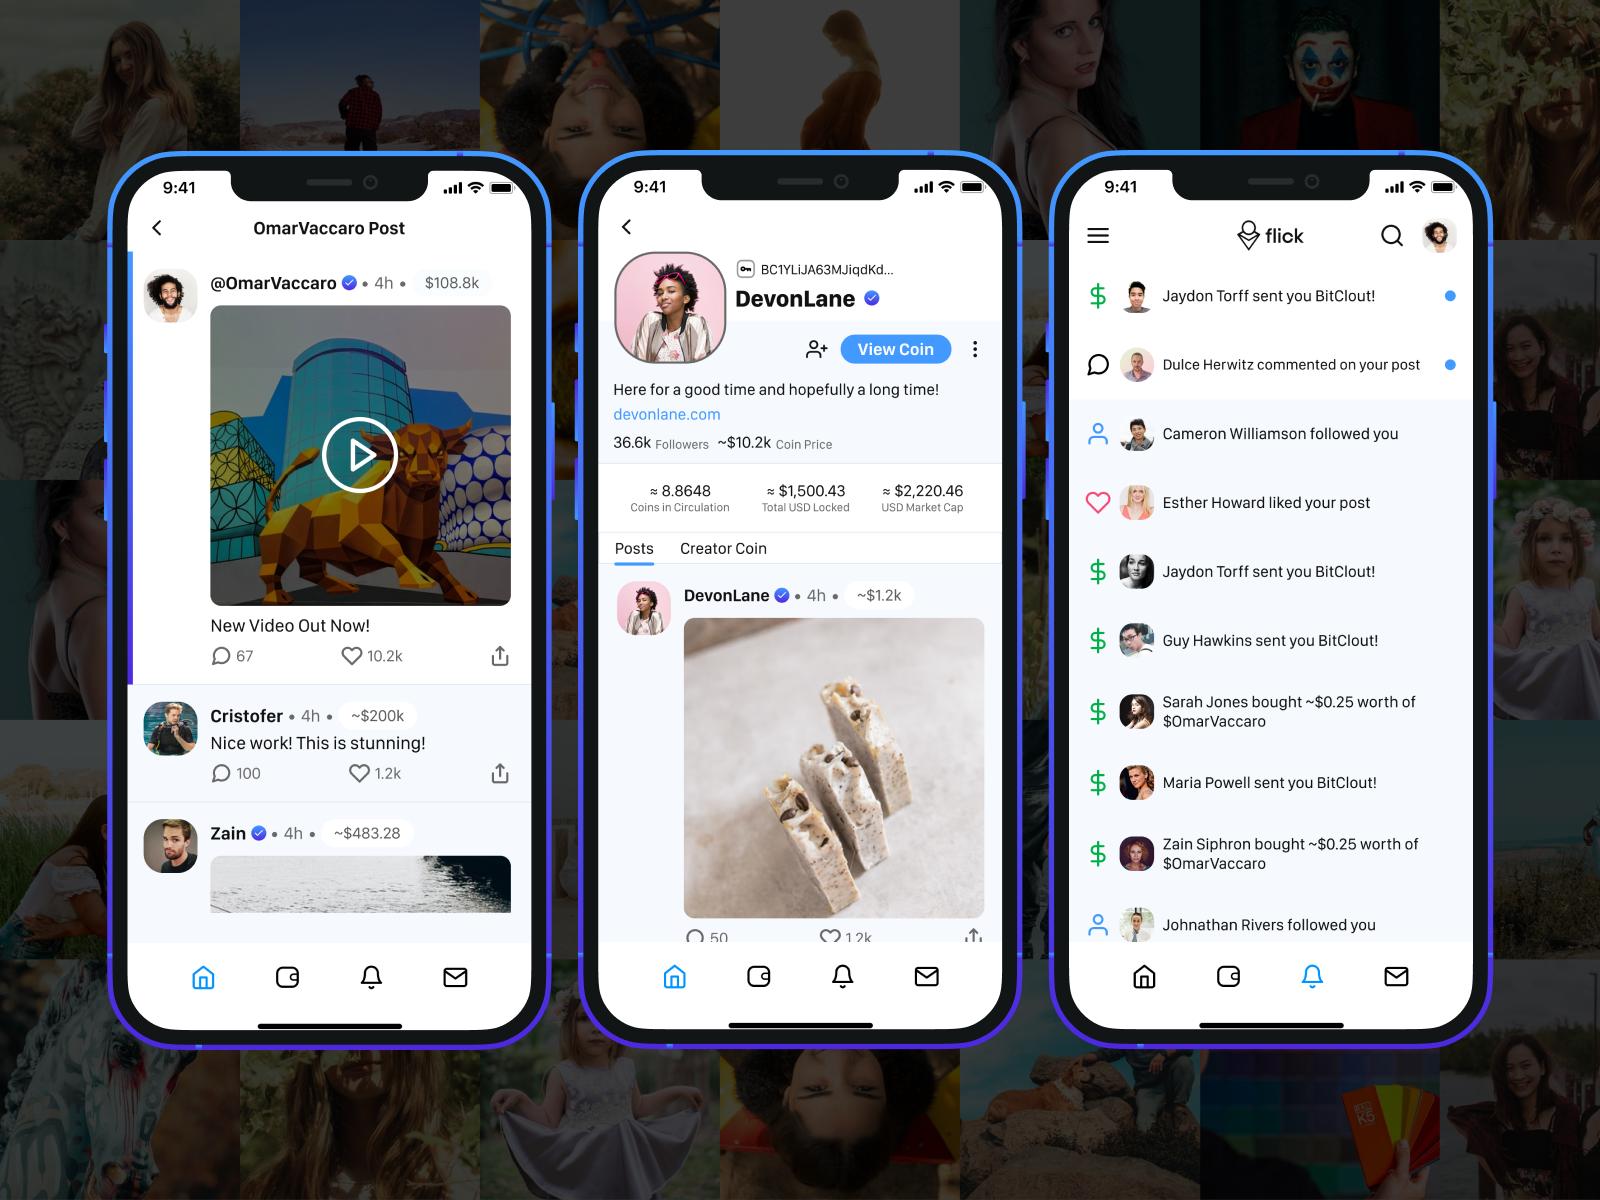 Flick - The BitClout App Launch